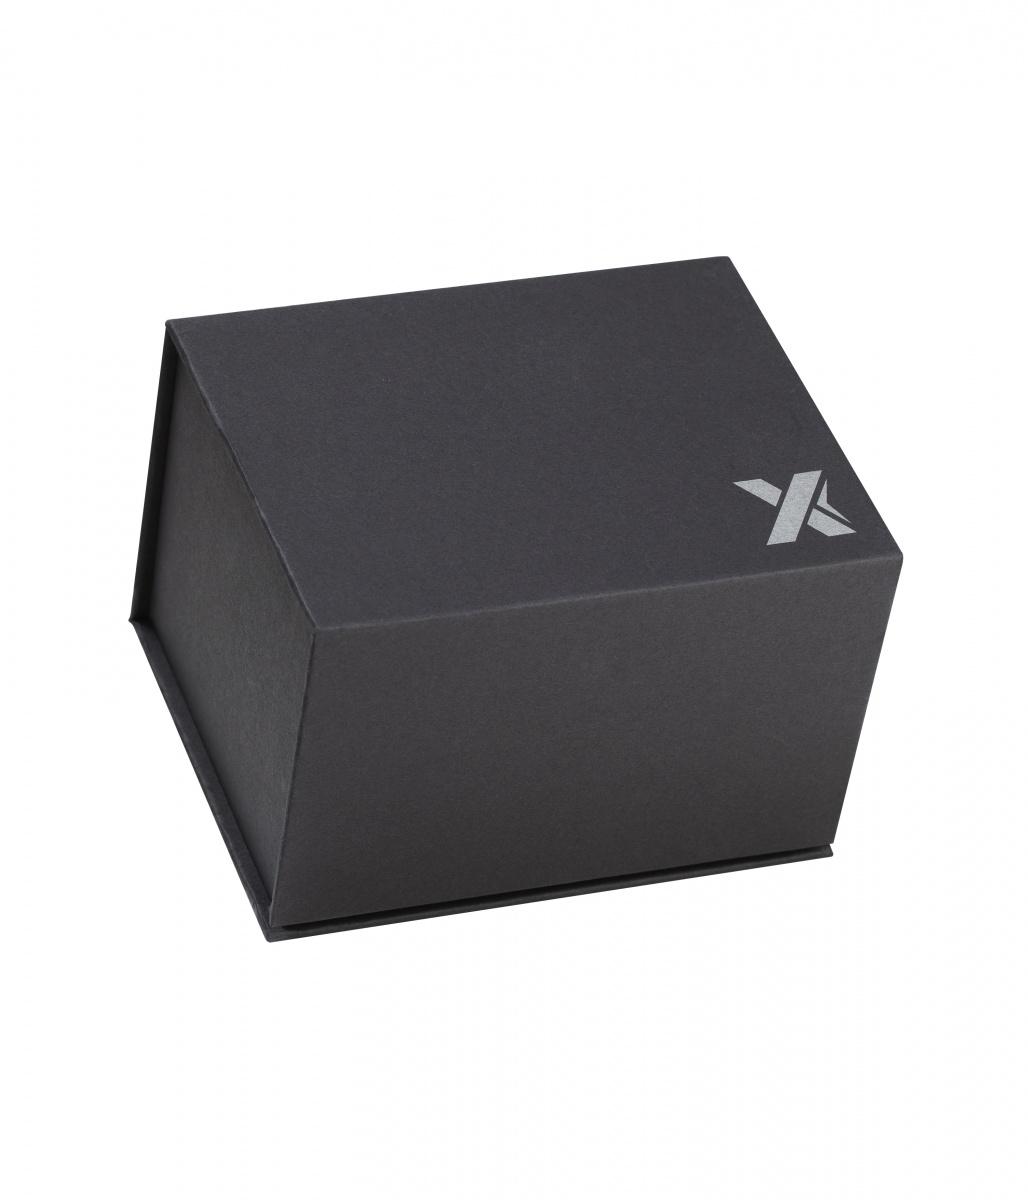 scx-design-o10-4a.zoom.jpg